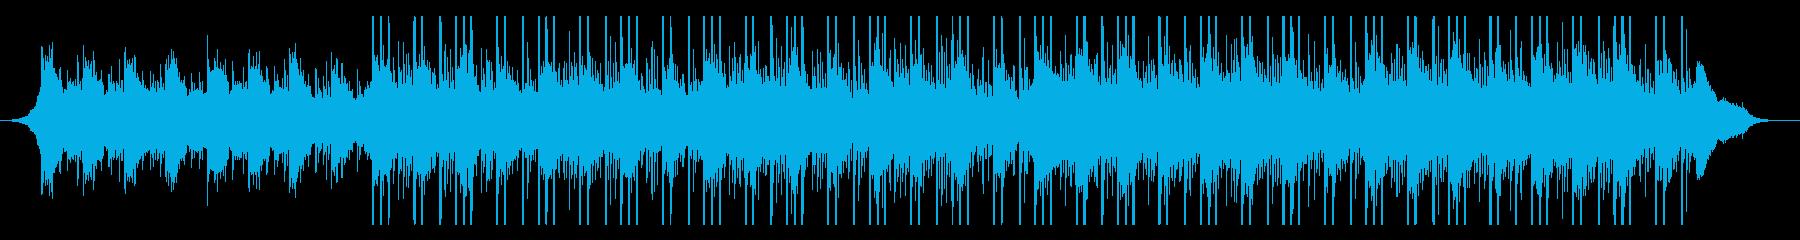 Innovative Technology (90 Sec)'s reproduced waveform